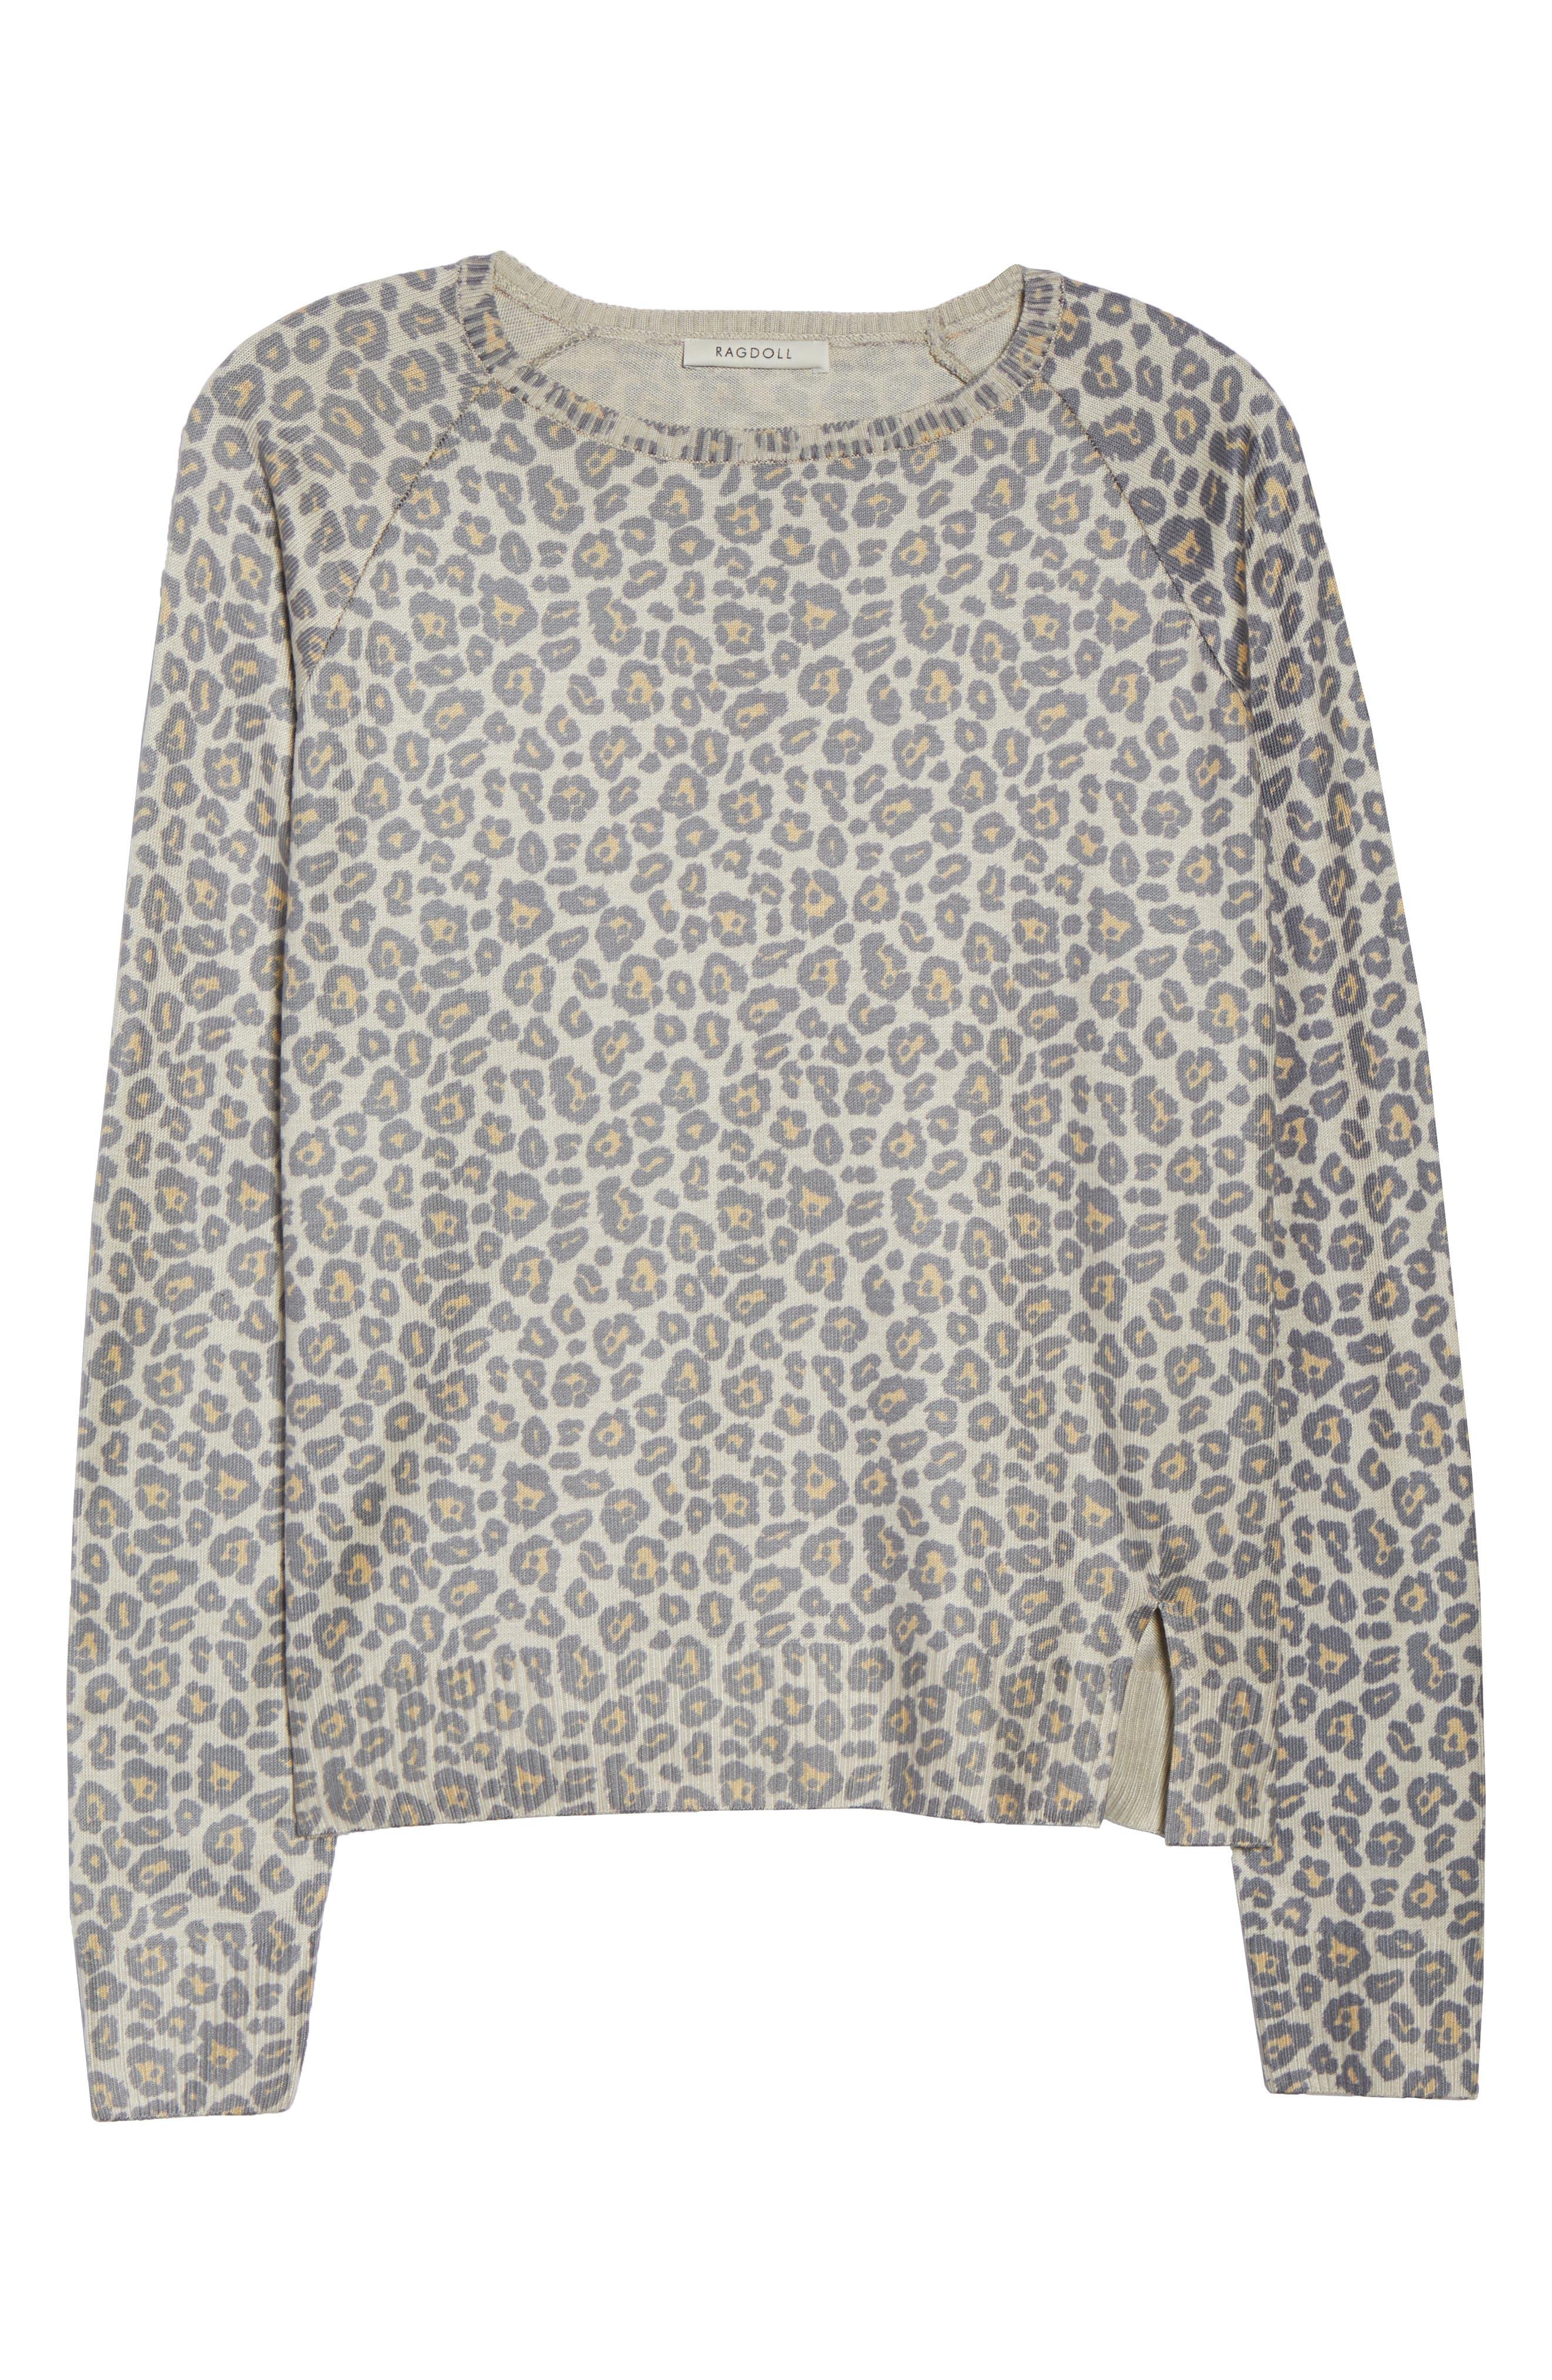 Leopard Print Sweatshirt,                             Alternate thumbnail 6, color,                             Beige Leopard